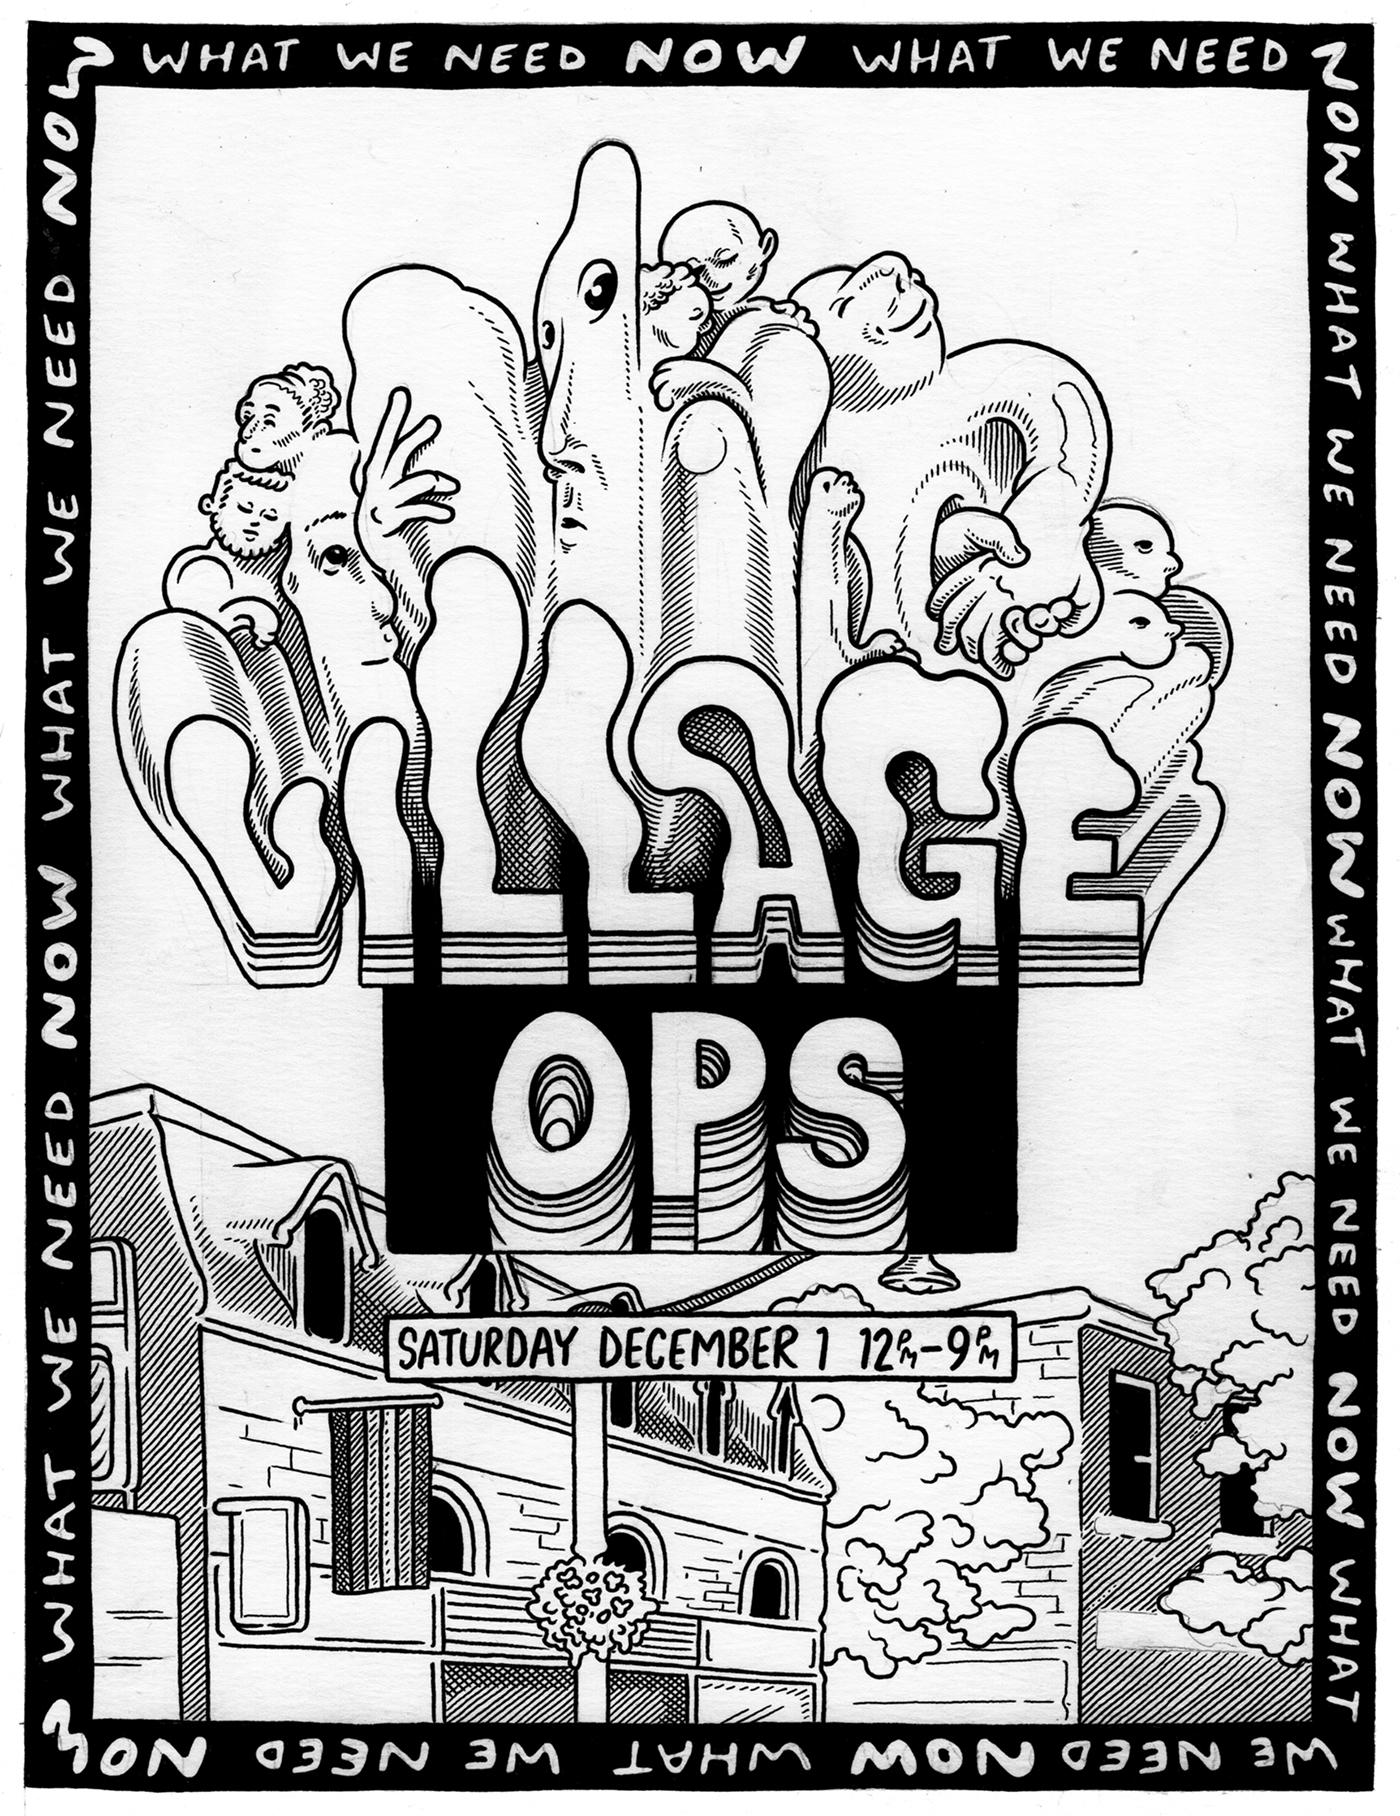 VillageOPS.jpg